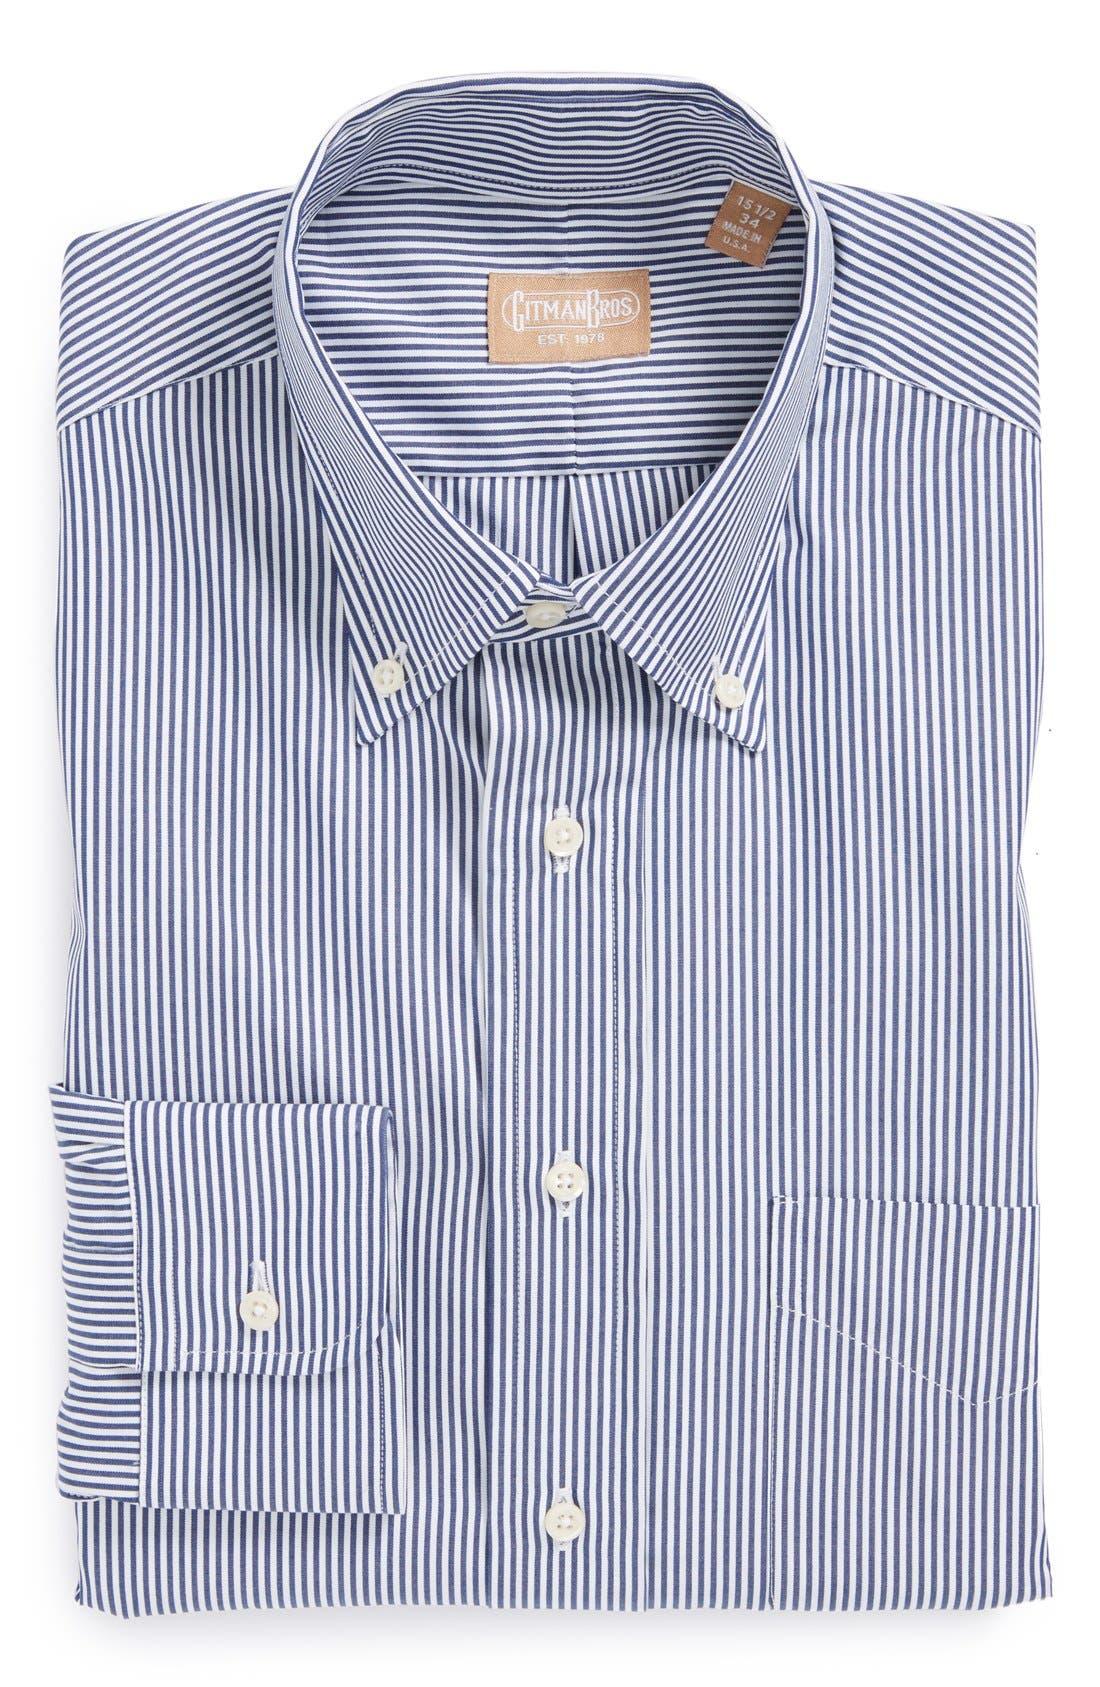 GITMAN Regular Fit Bengal Stripe Cotton Broadcloth Button